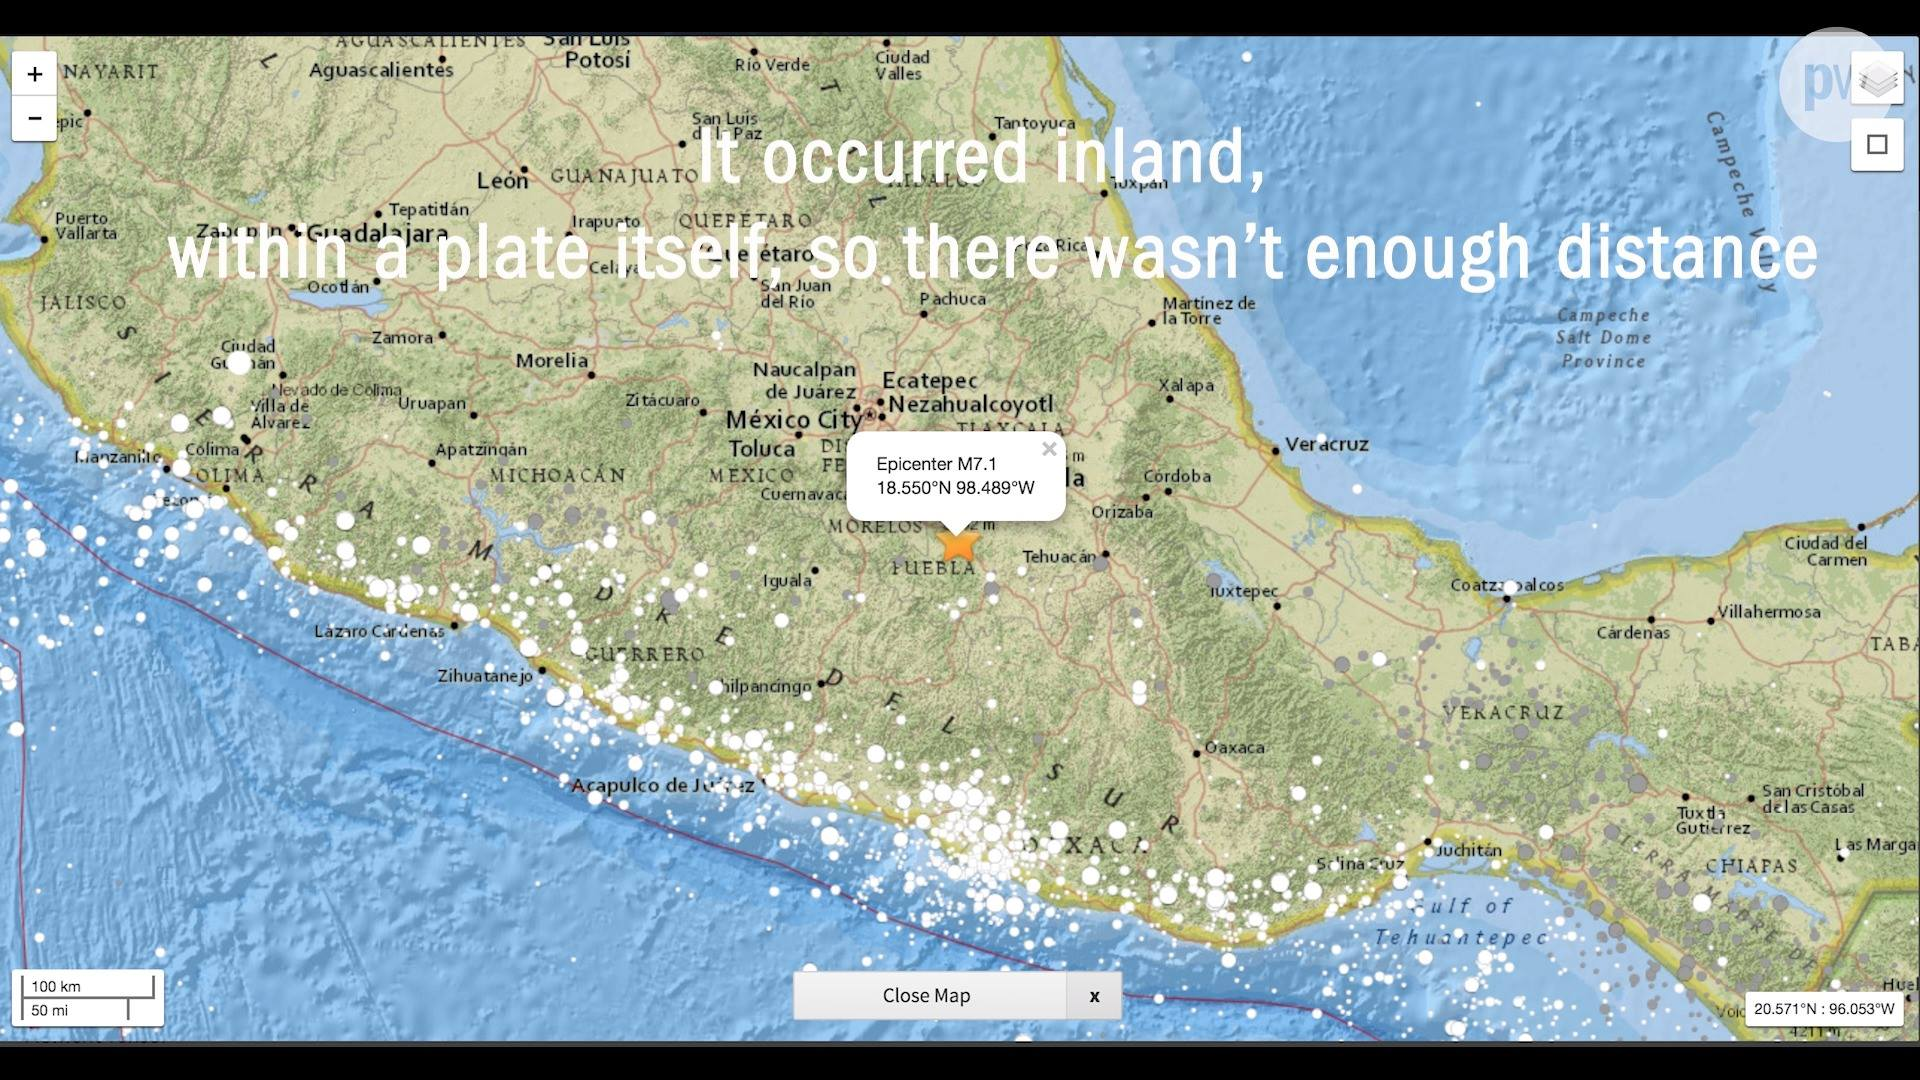 19 September 2017 Central Mexico earthquake explained